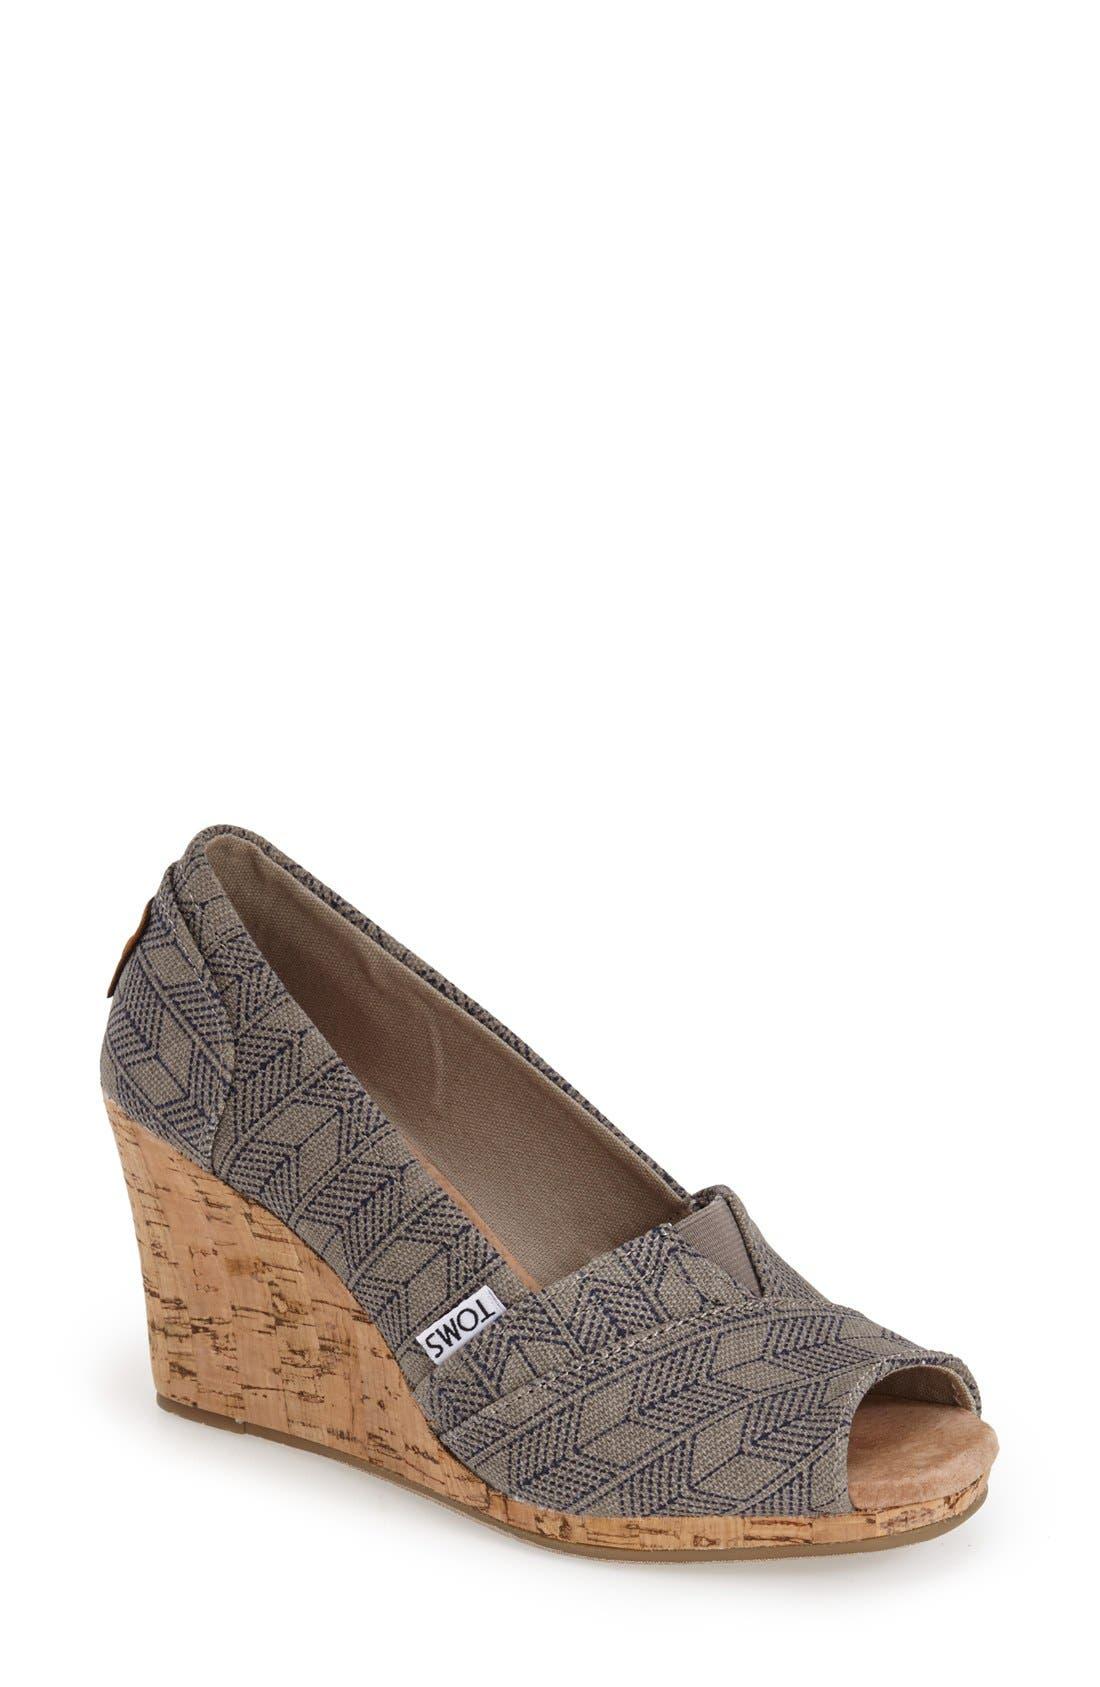 Alternate Image 1 Selected - TOMS 'Classic - Shashiko' Woven Wedge Sandal (Women)